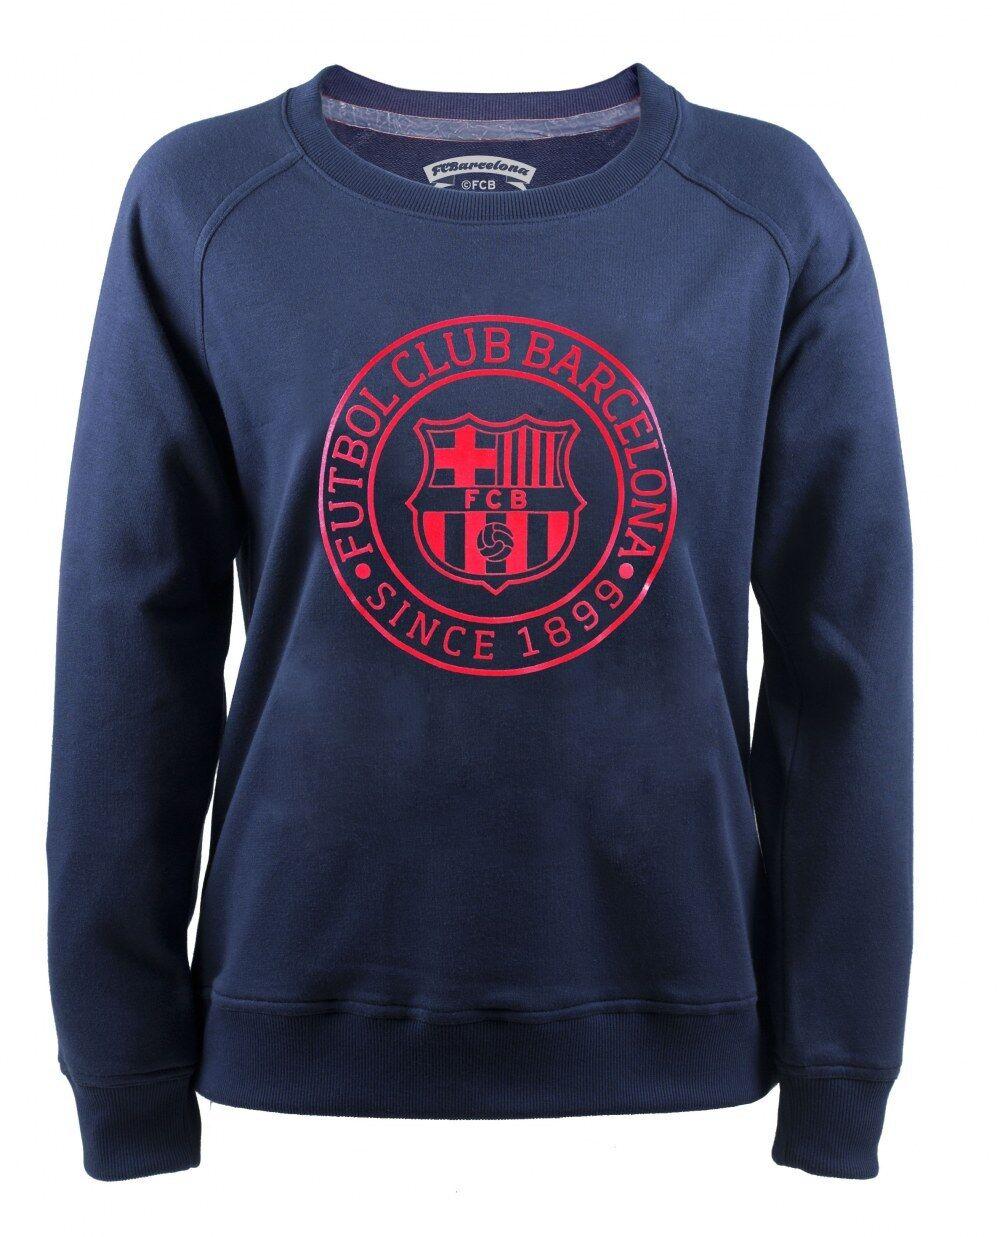 Sweatshirt offiziel Barcelona FCB Seit 1899 dunkelblau Rundhals Frau Original